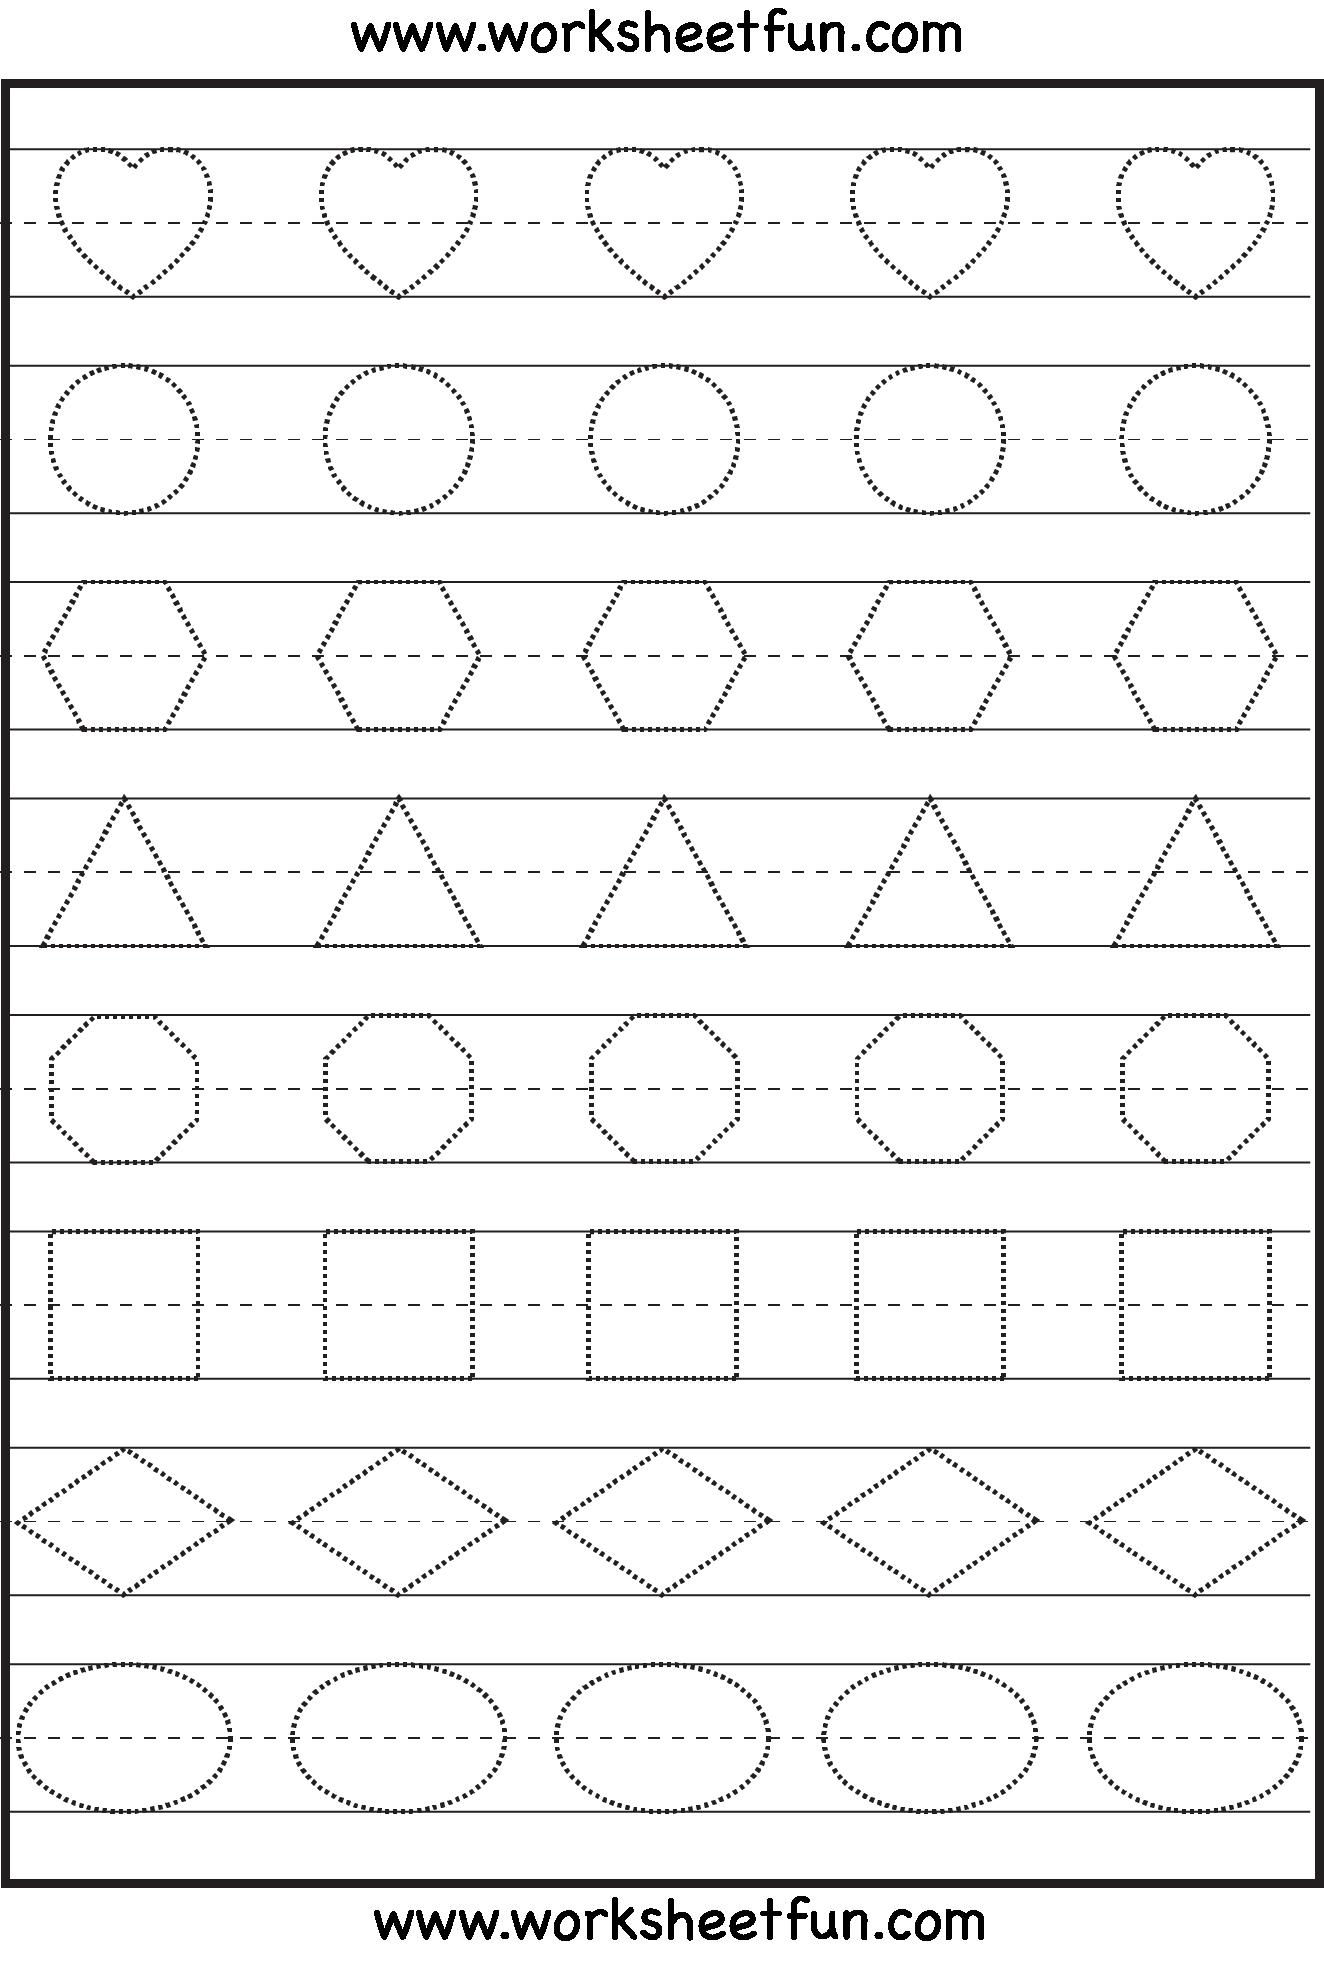 5 Images of Free Printable Shapes Preschool Worksheets